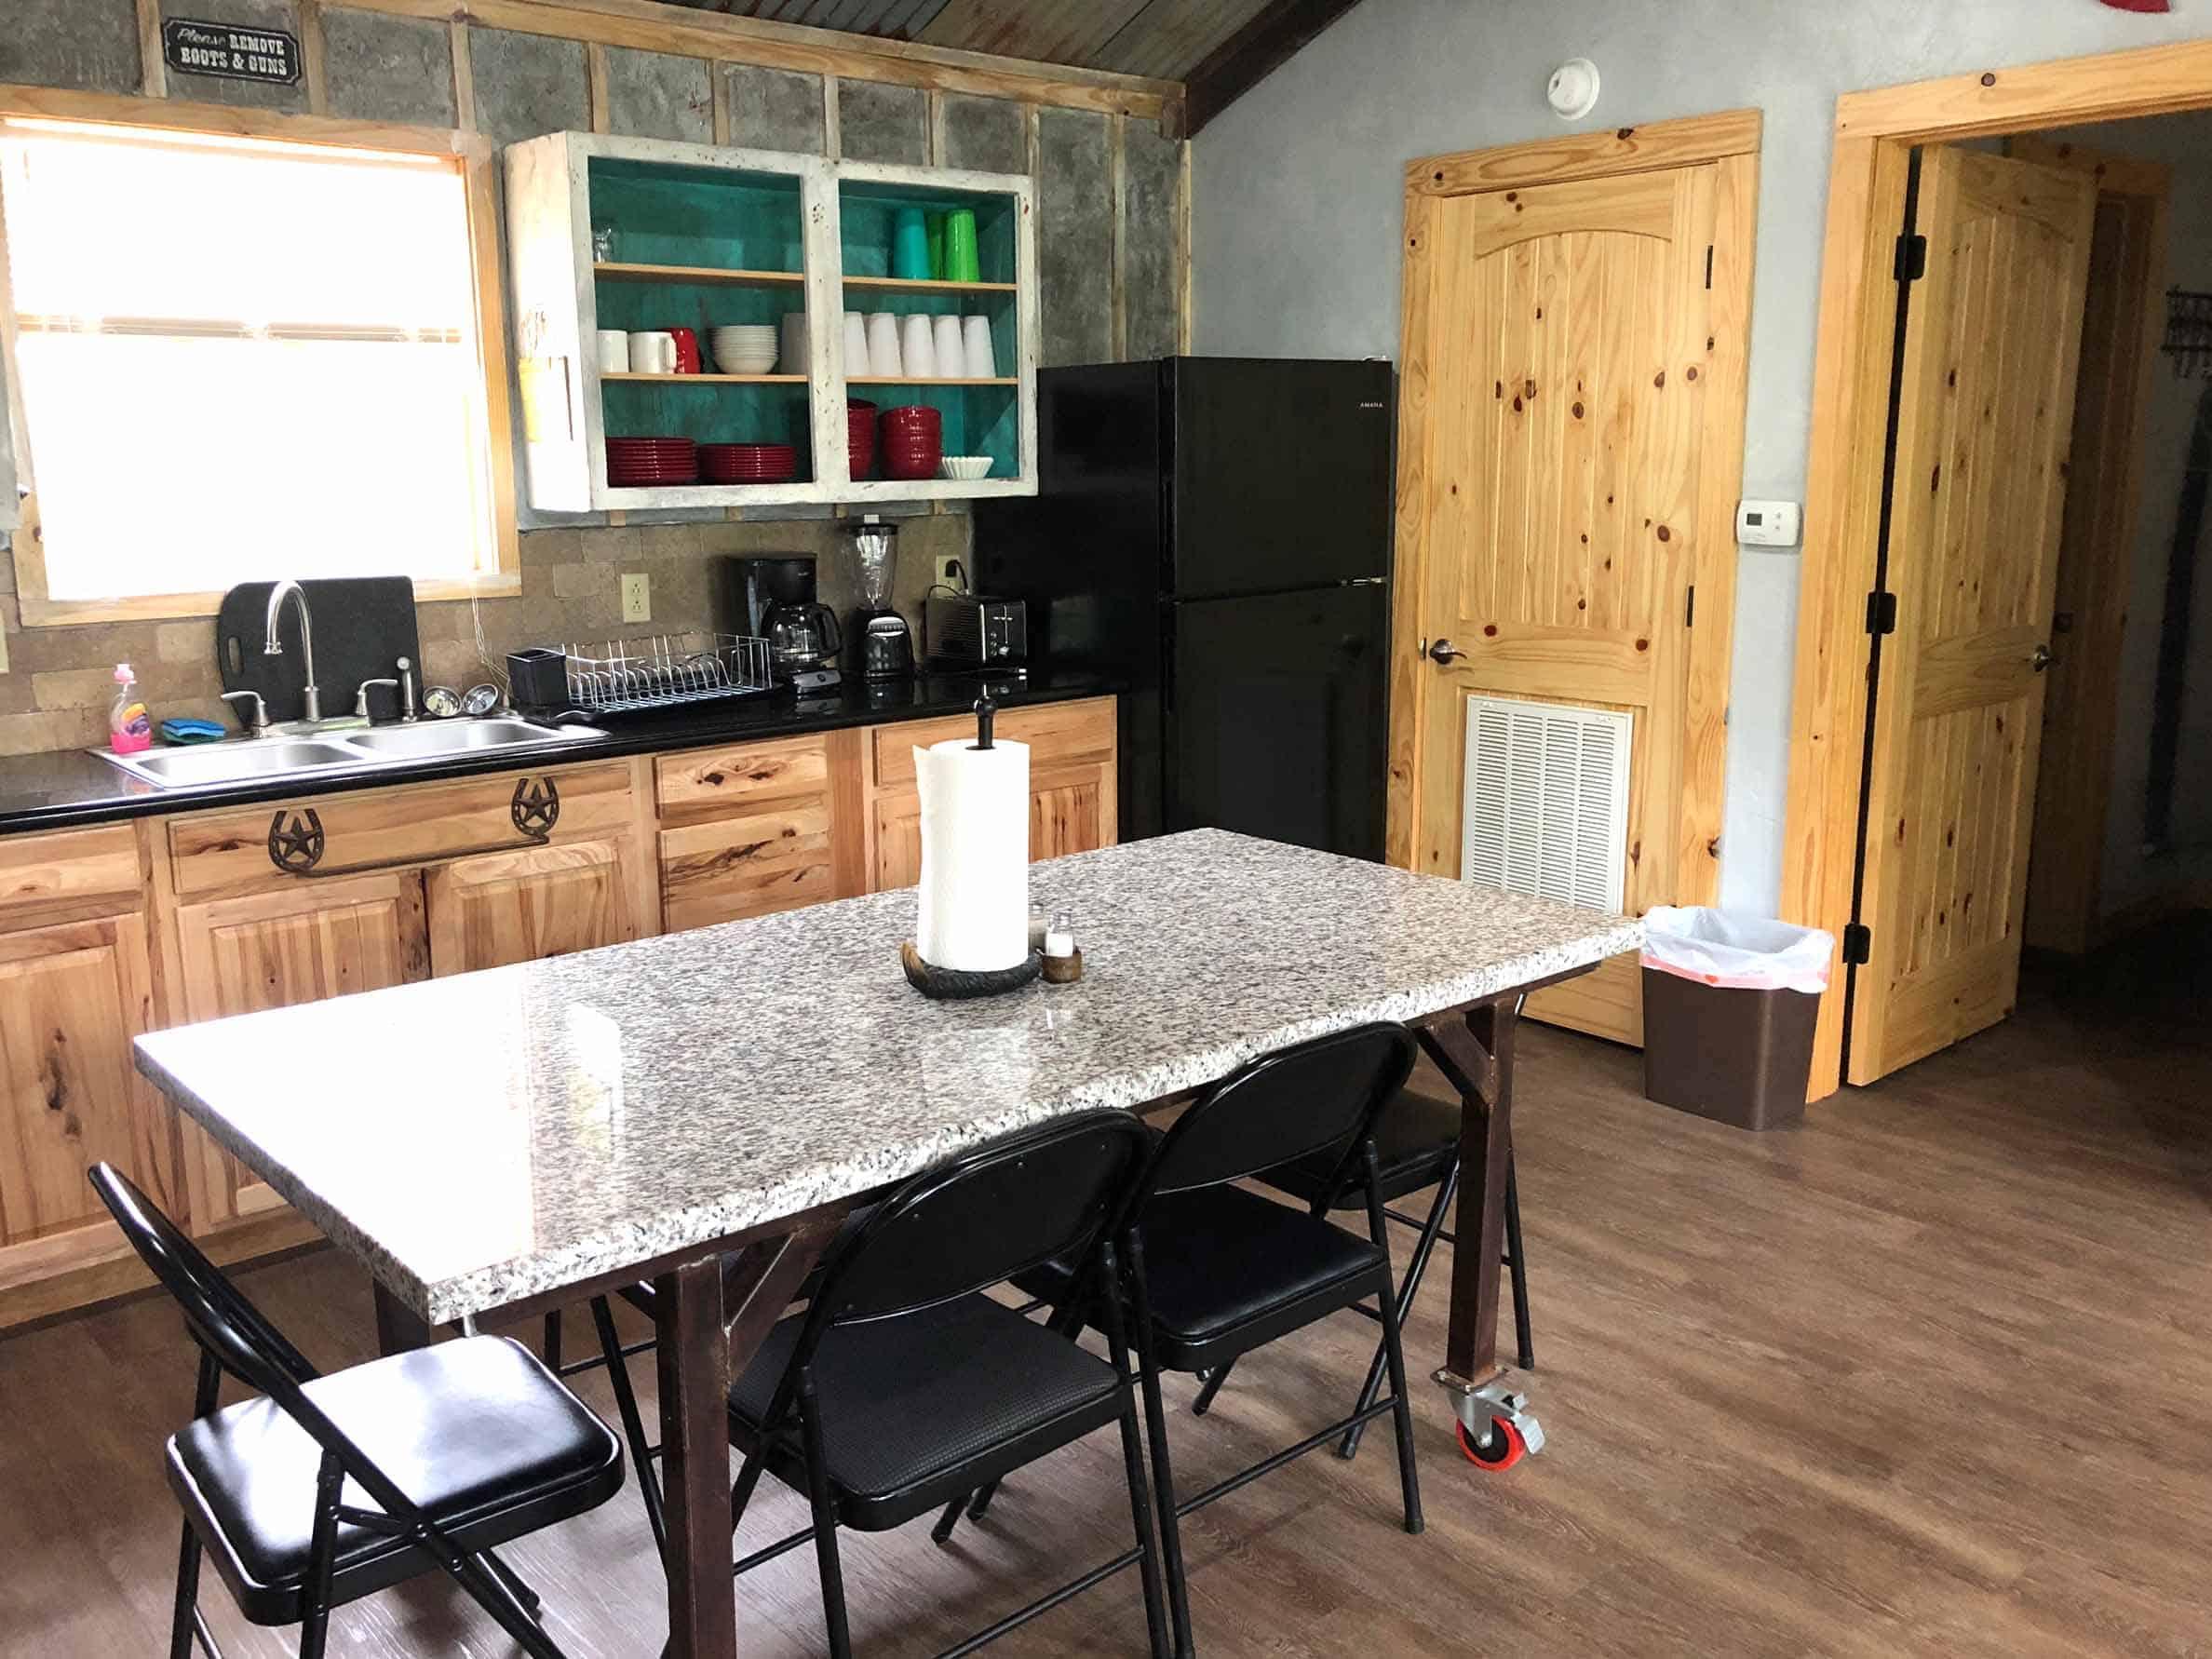 BackWater-Jacks-Cabin-Longhorn-kitchen